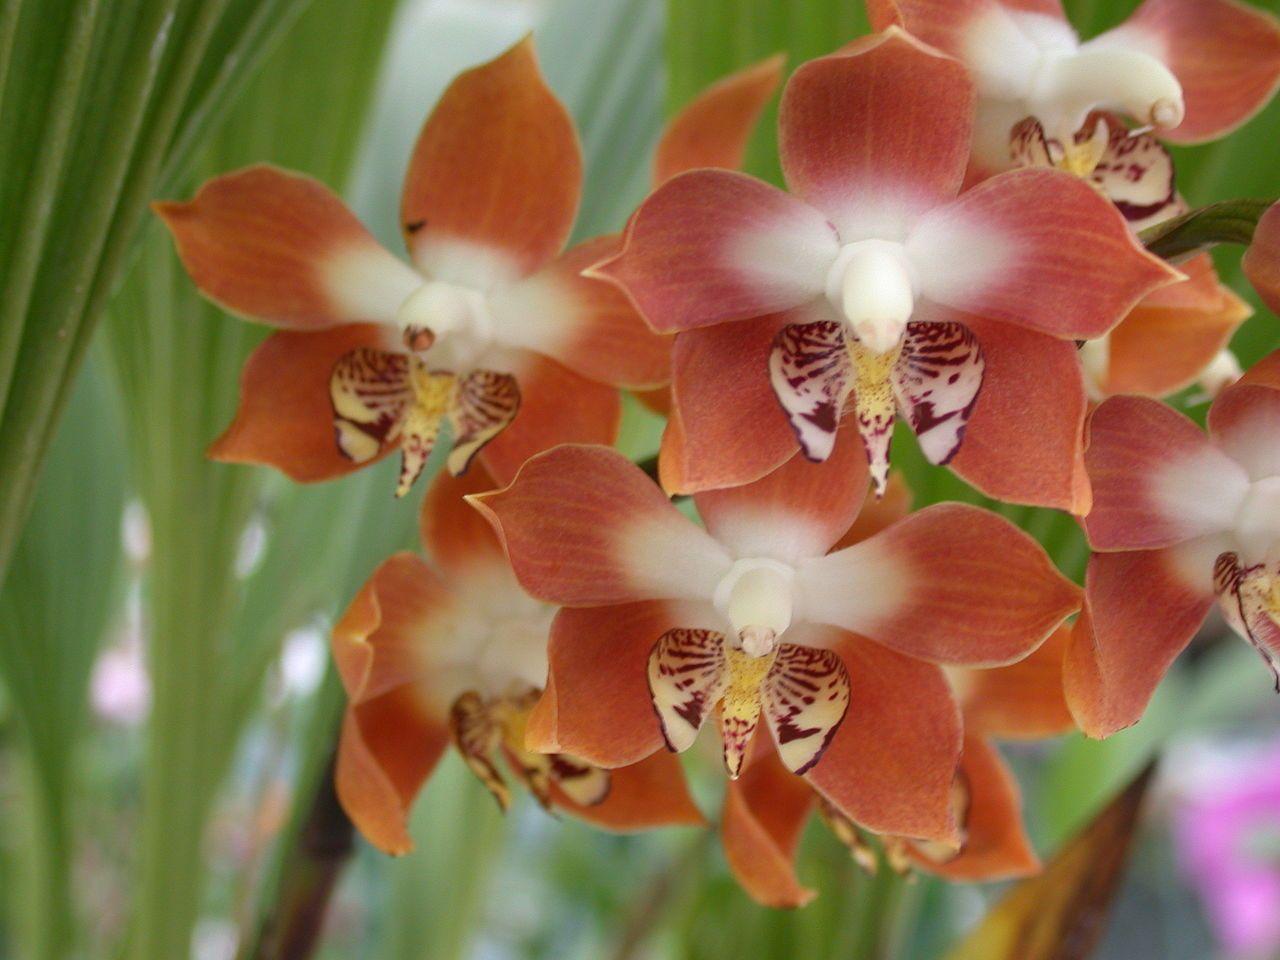 Orchid neomoorea irrorata native to columbia panama nervilia